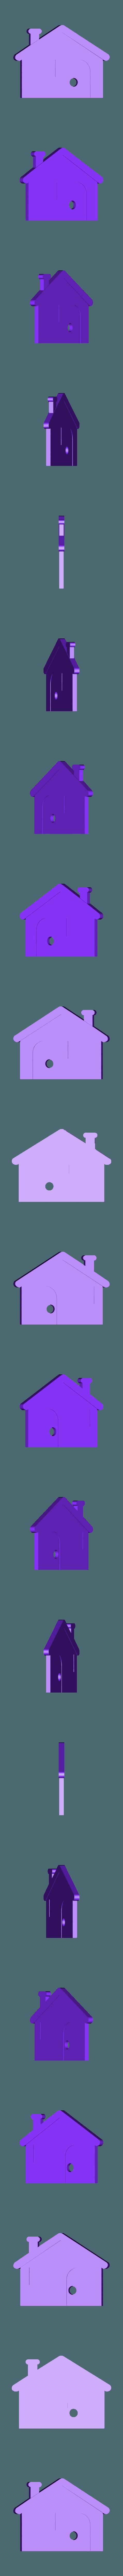 3dnaowMaisonpc.STL Download free STL file Keychain House • 3D print model, 3DNaow